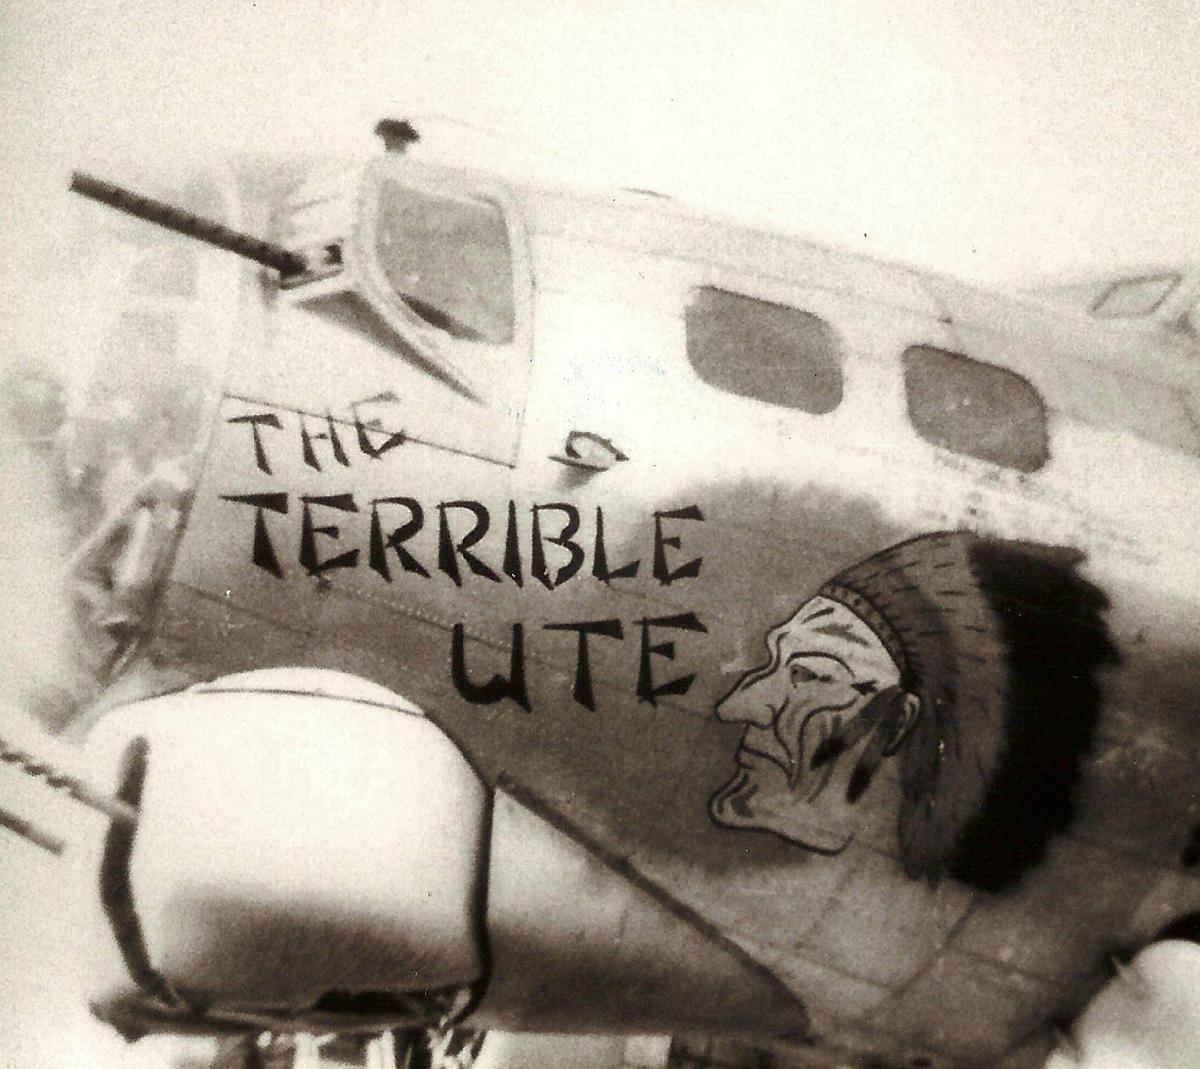 B-17 #43-39060 / The Terrible Ute